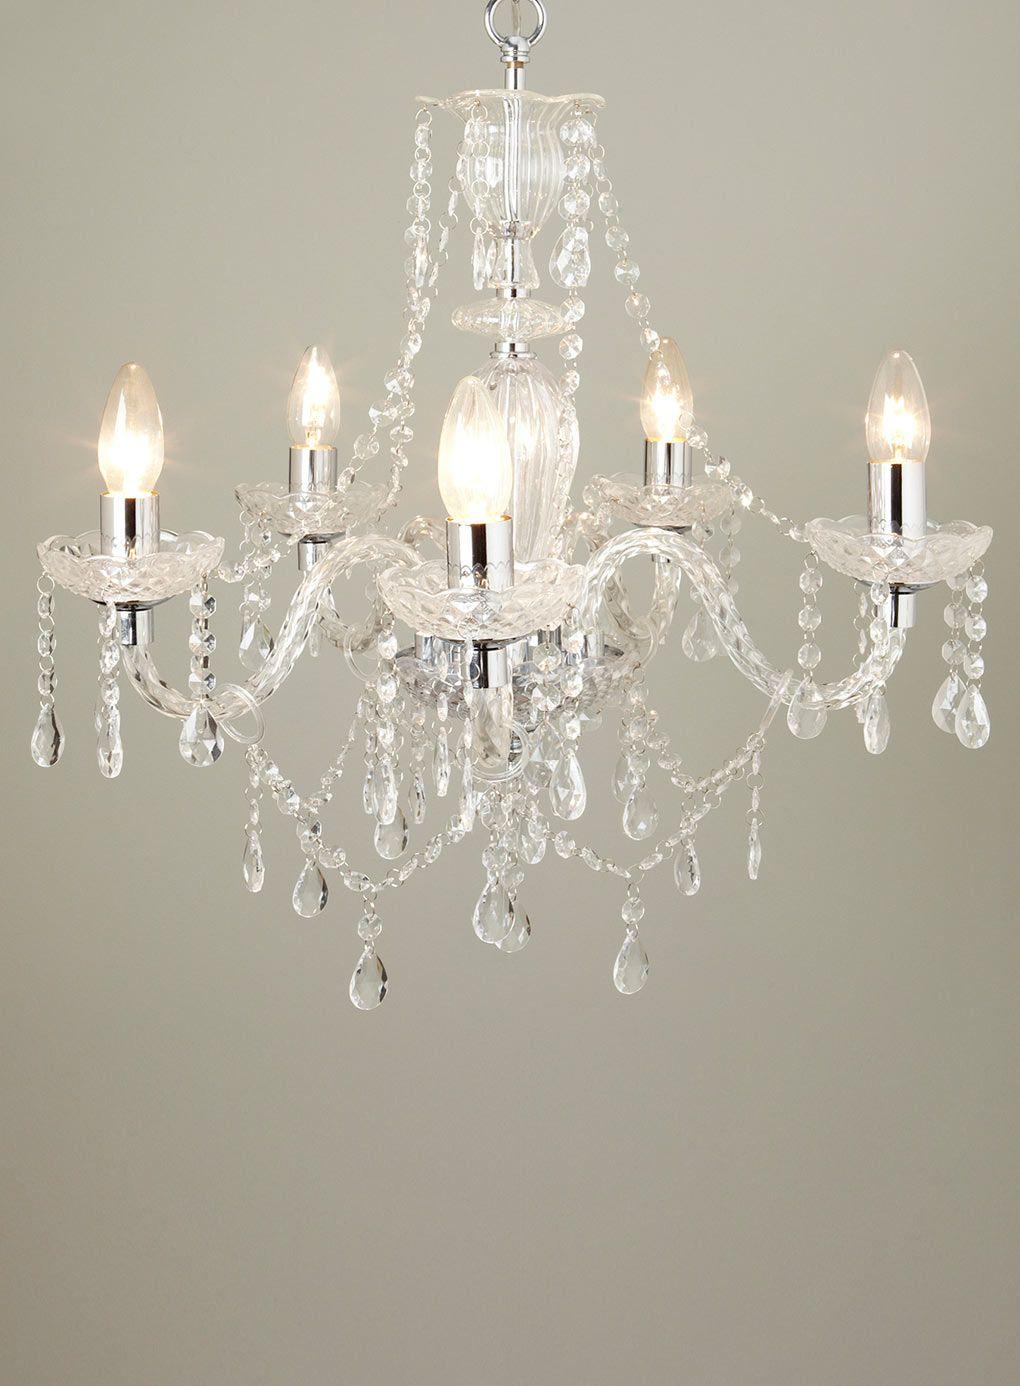 Bhs Chandelier Lighting Design Ideas